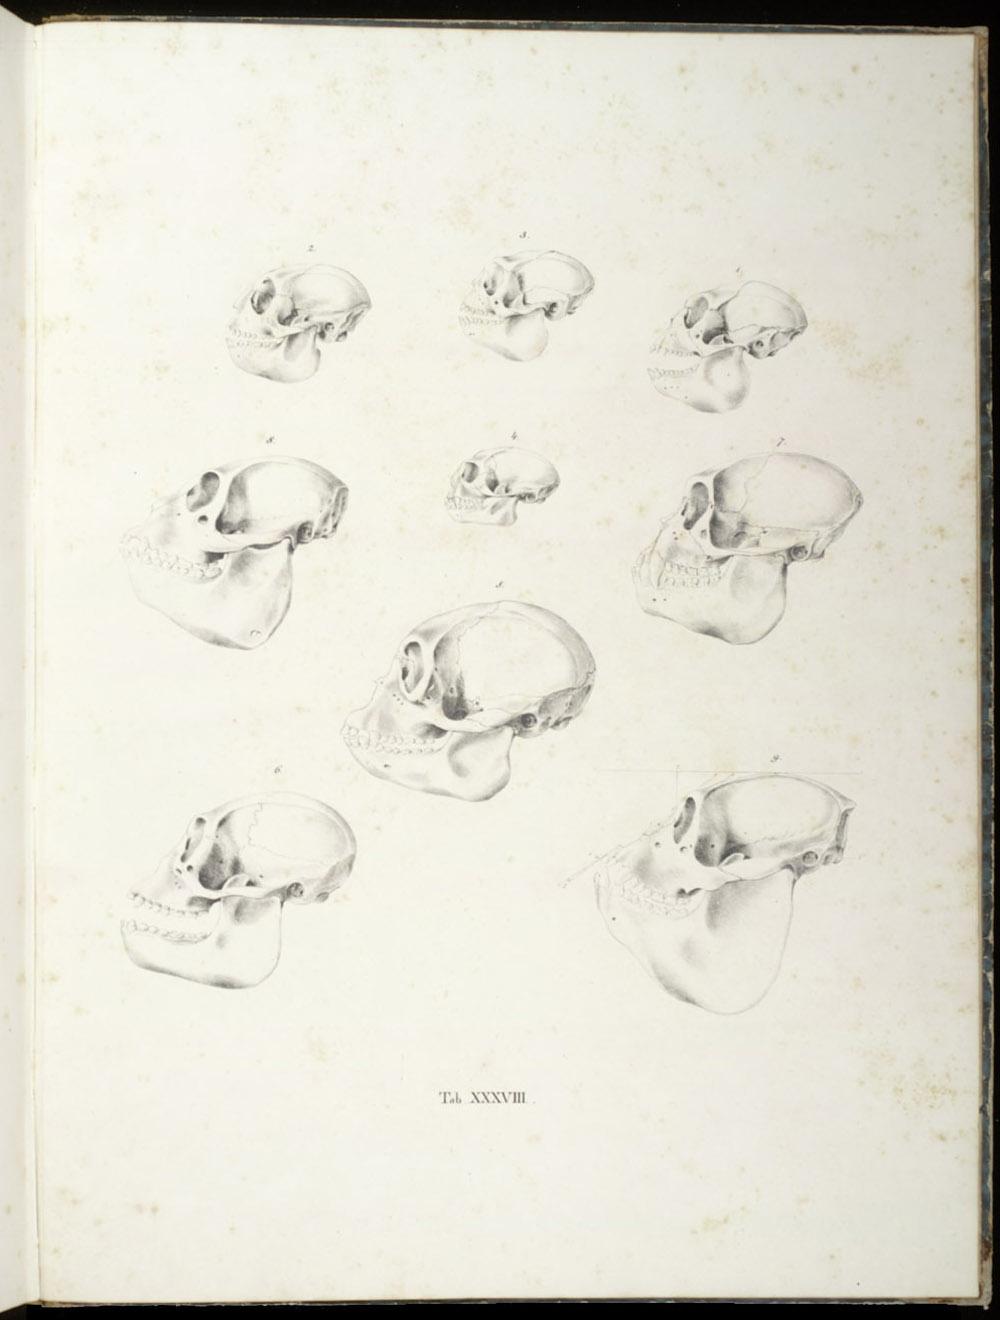 Tab. XXXVIII: Monkey skulls,  Image number:SIL6-2-167a